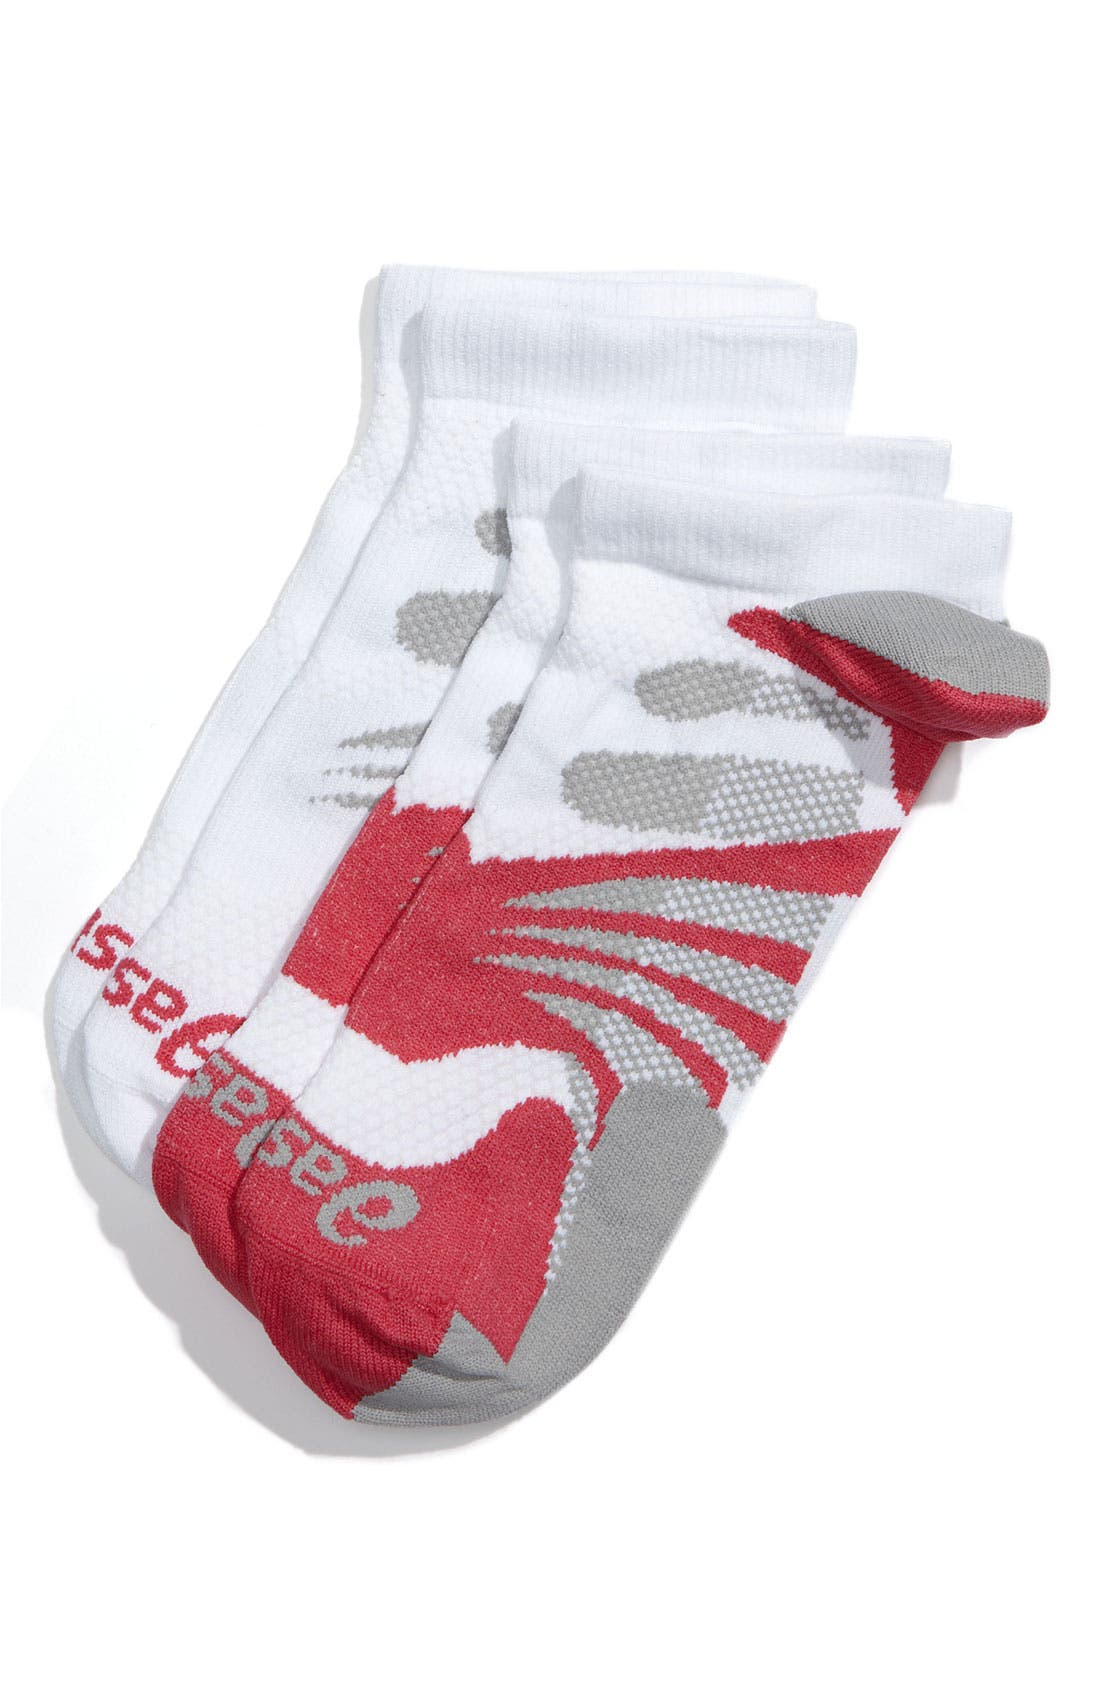 Main Image - ASICS® 'Hera Diva Sleek' Running Socks (2-Pack) (Women)